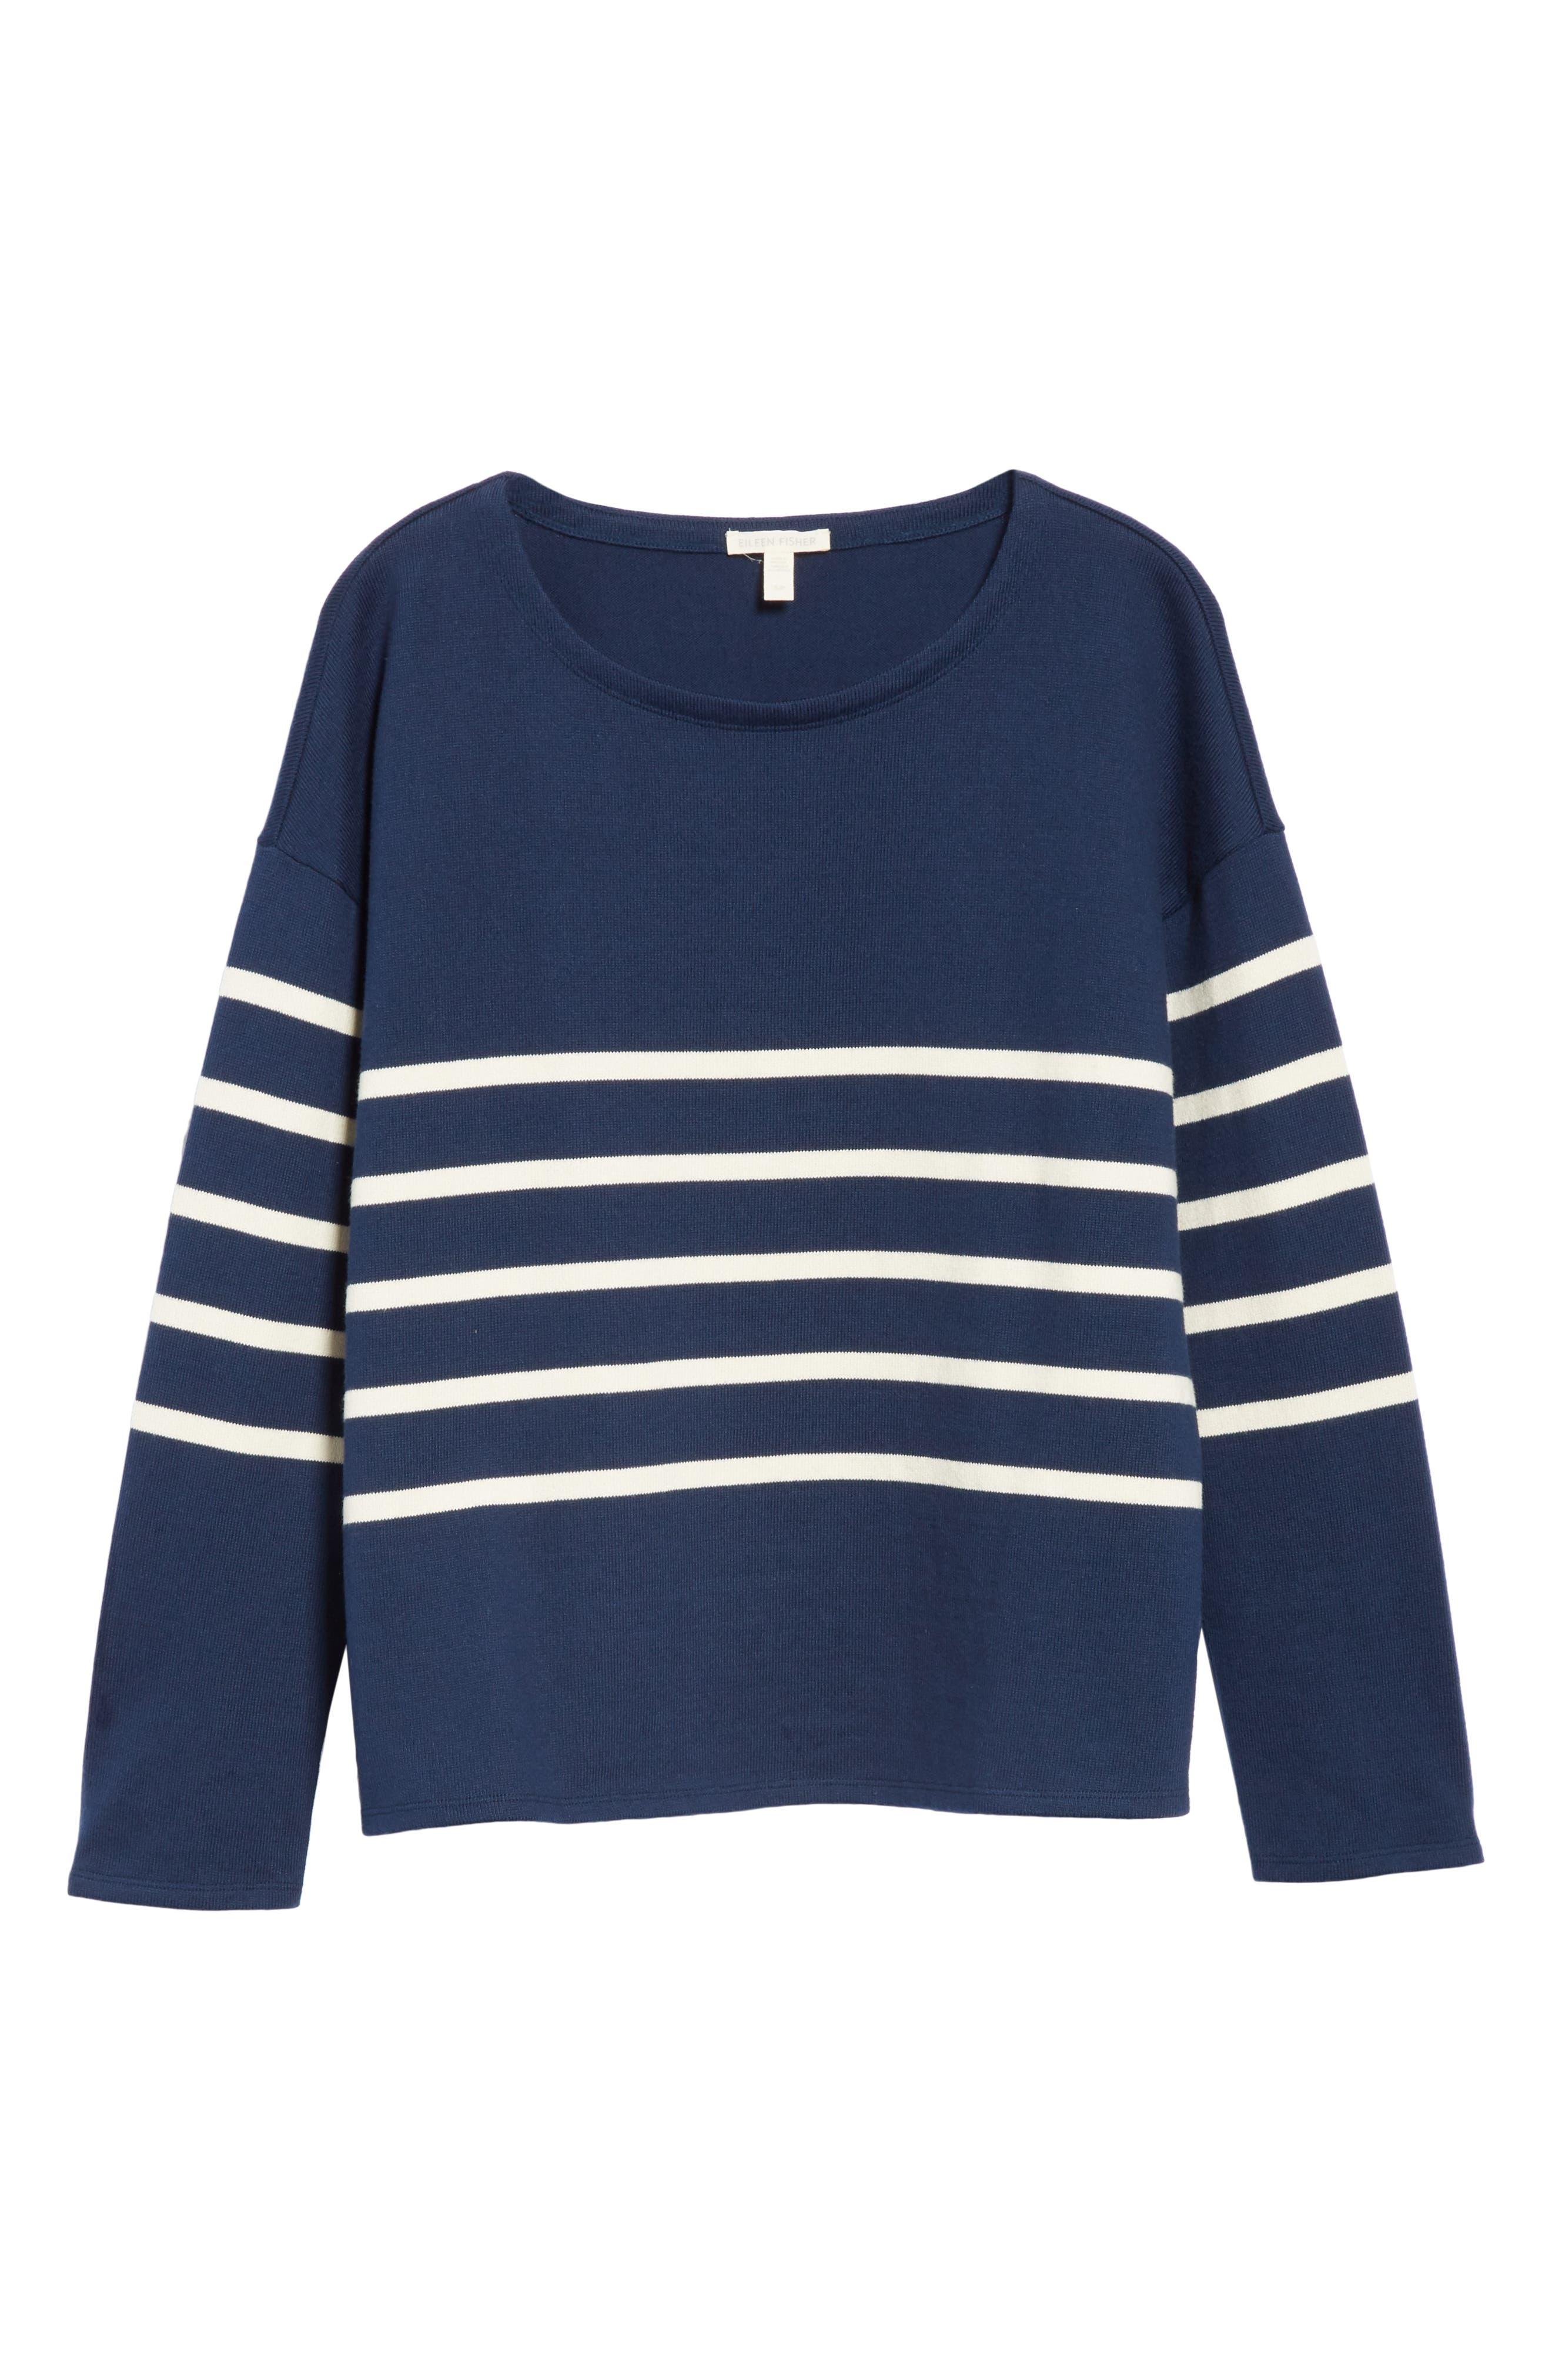 EILEEN FISHER, Stripe Organic Cotton Sweater, Alternate thumbnail 6, color, DENIM